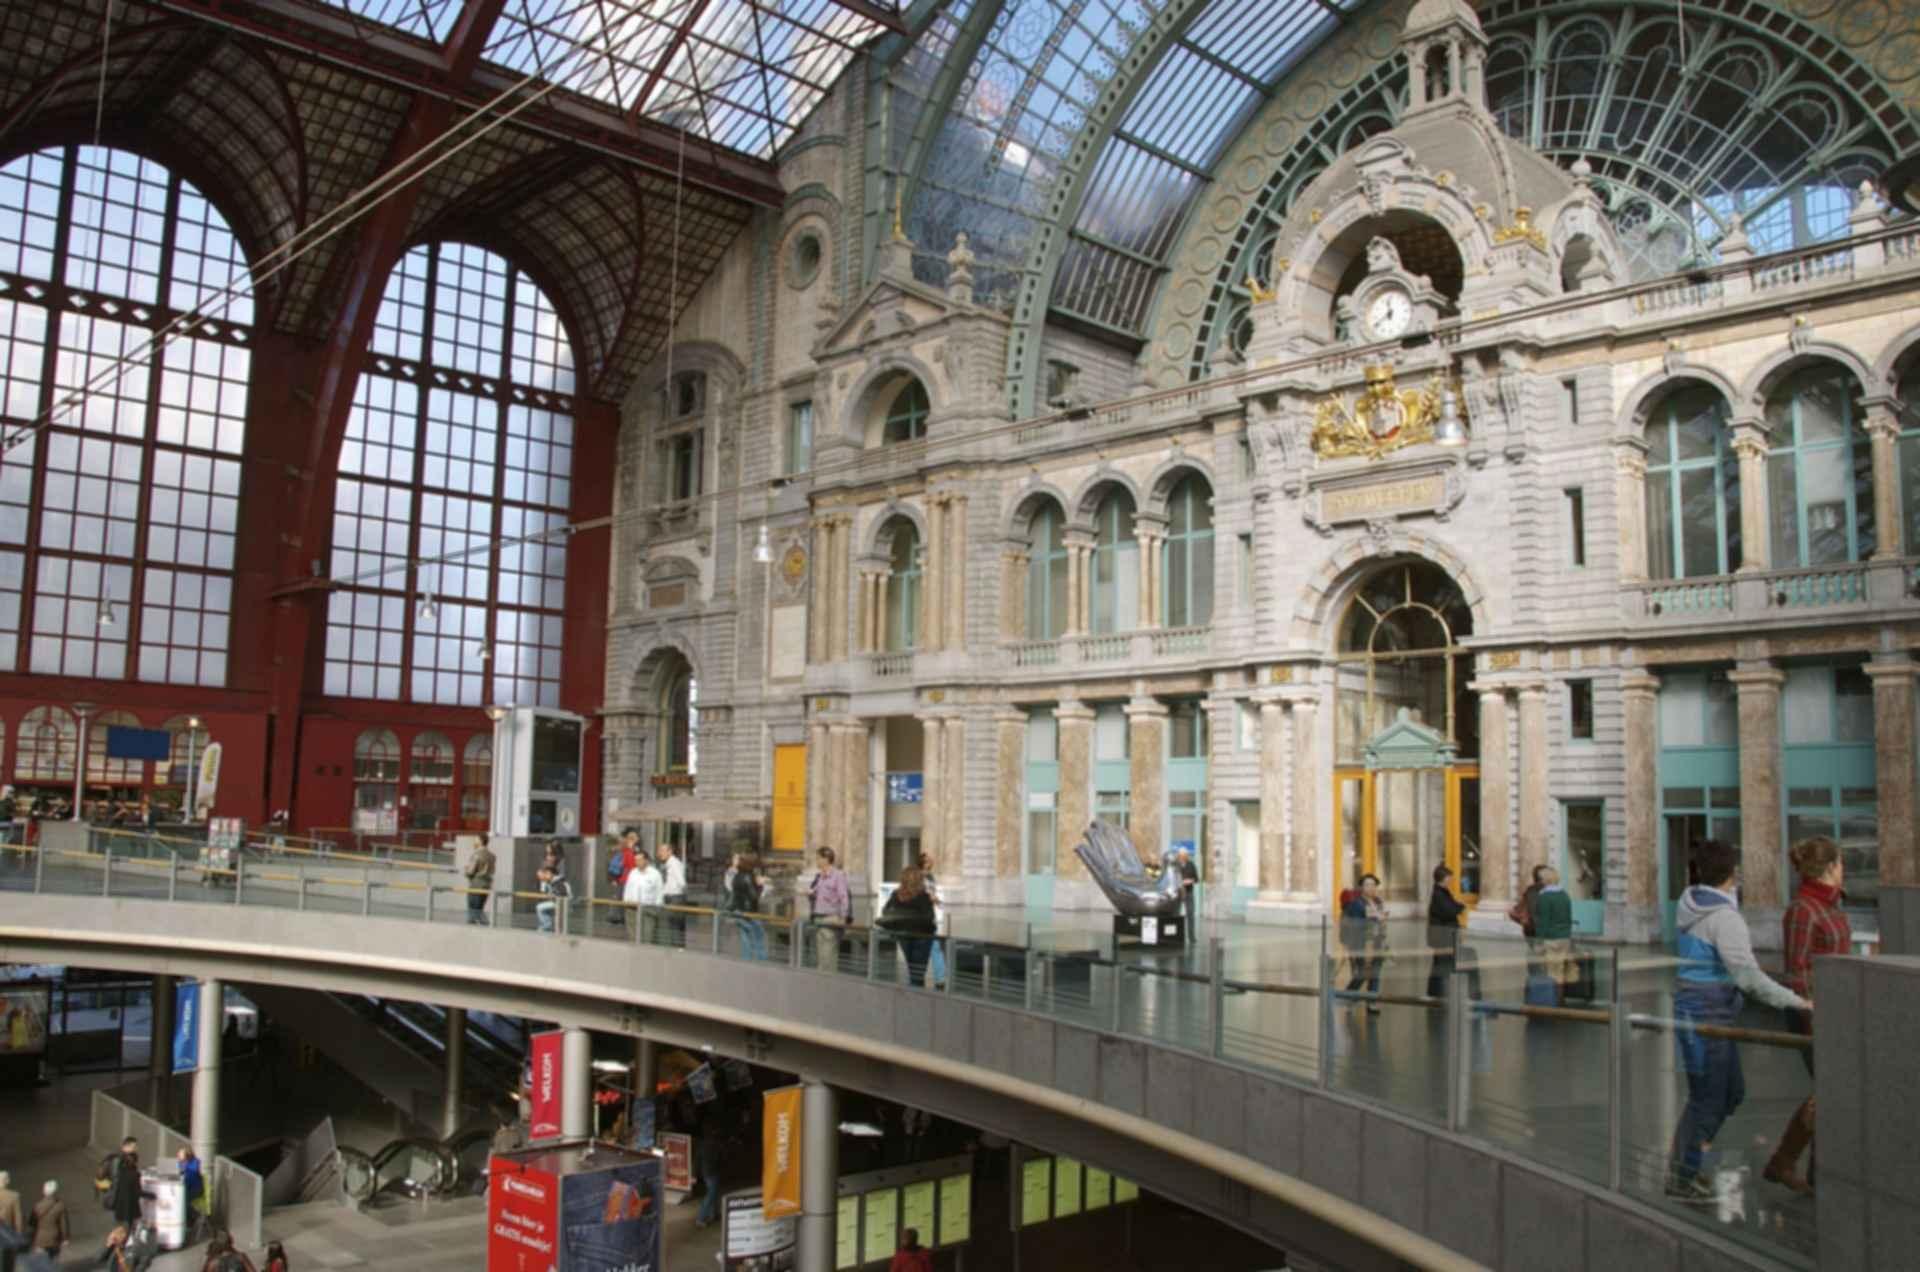 Antwerpen-Centraal Station - interior